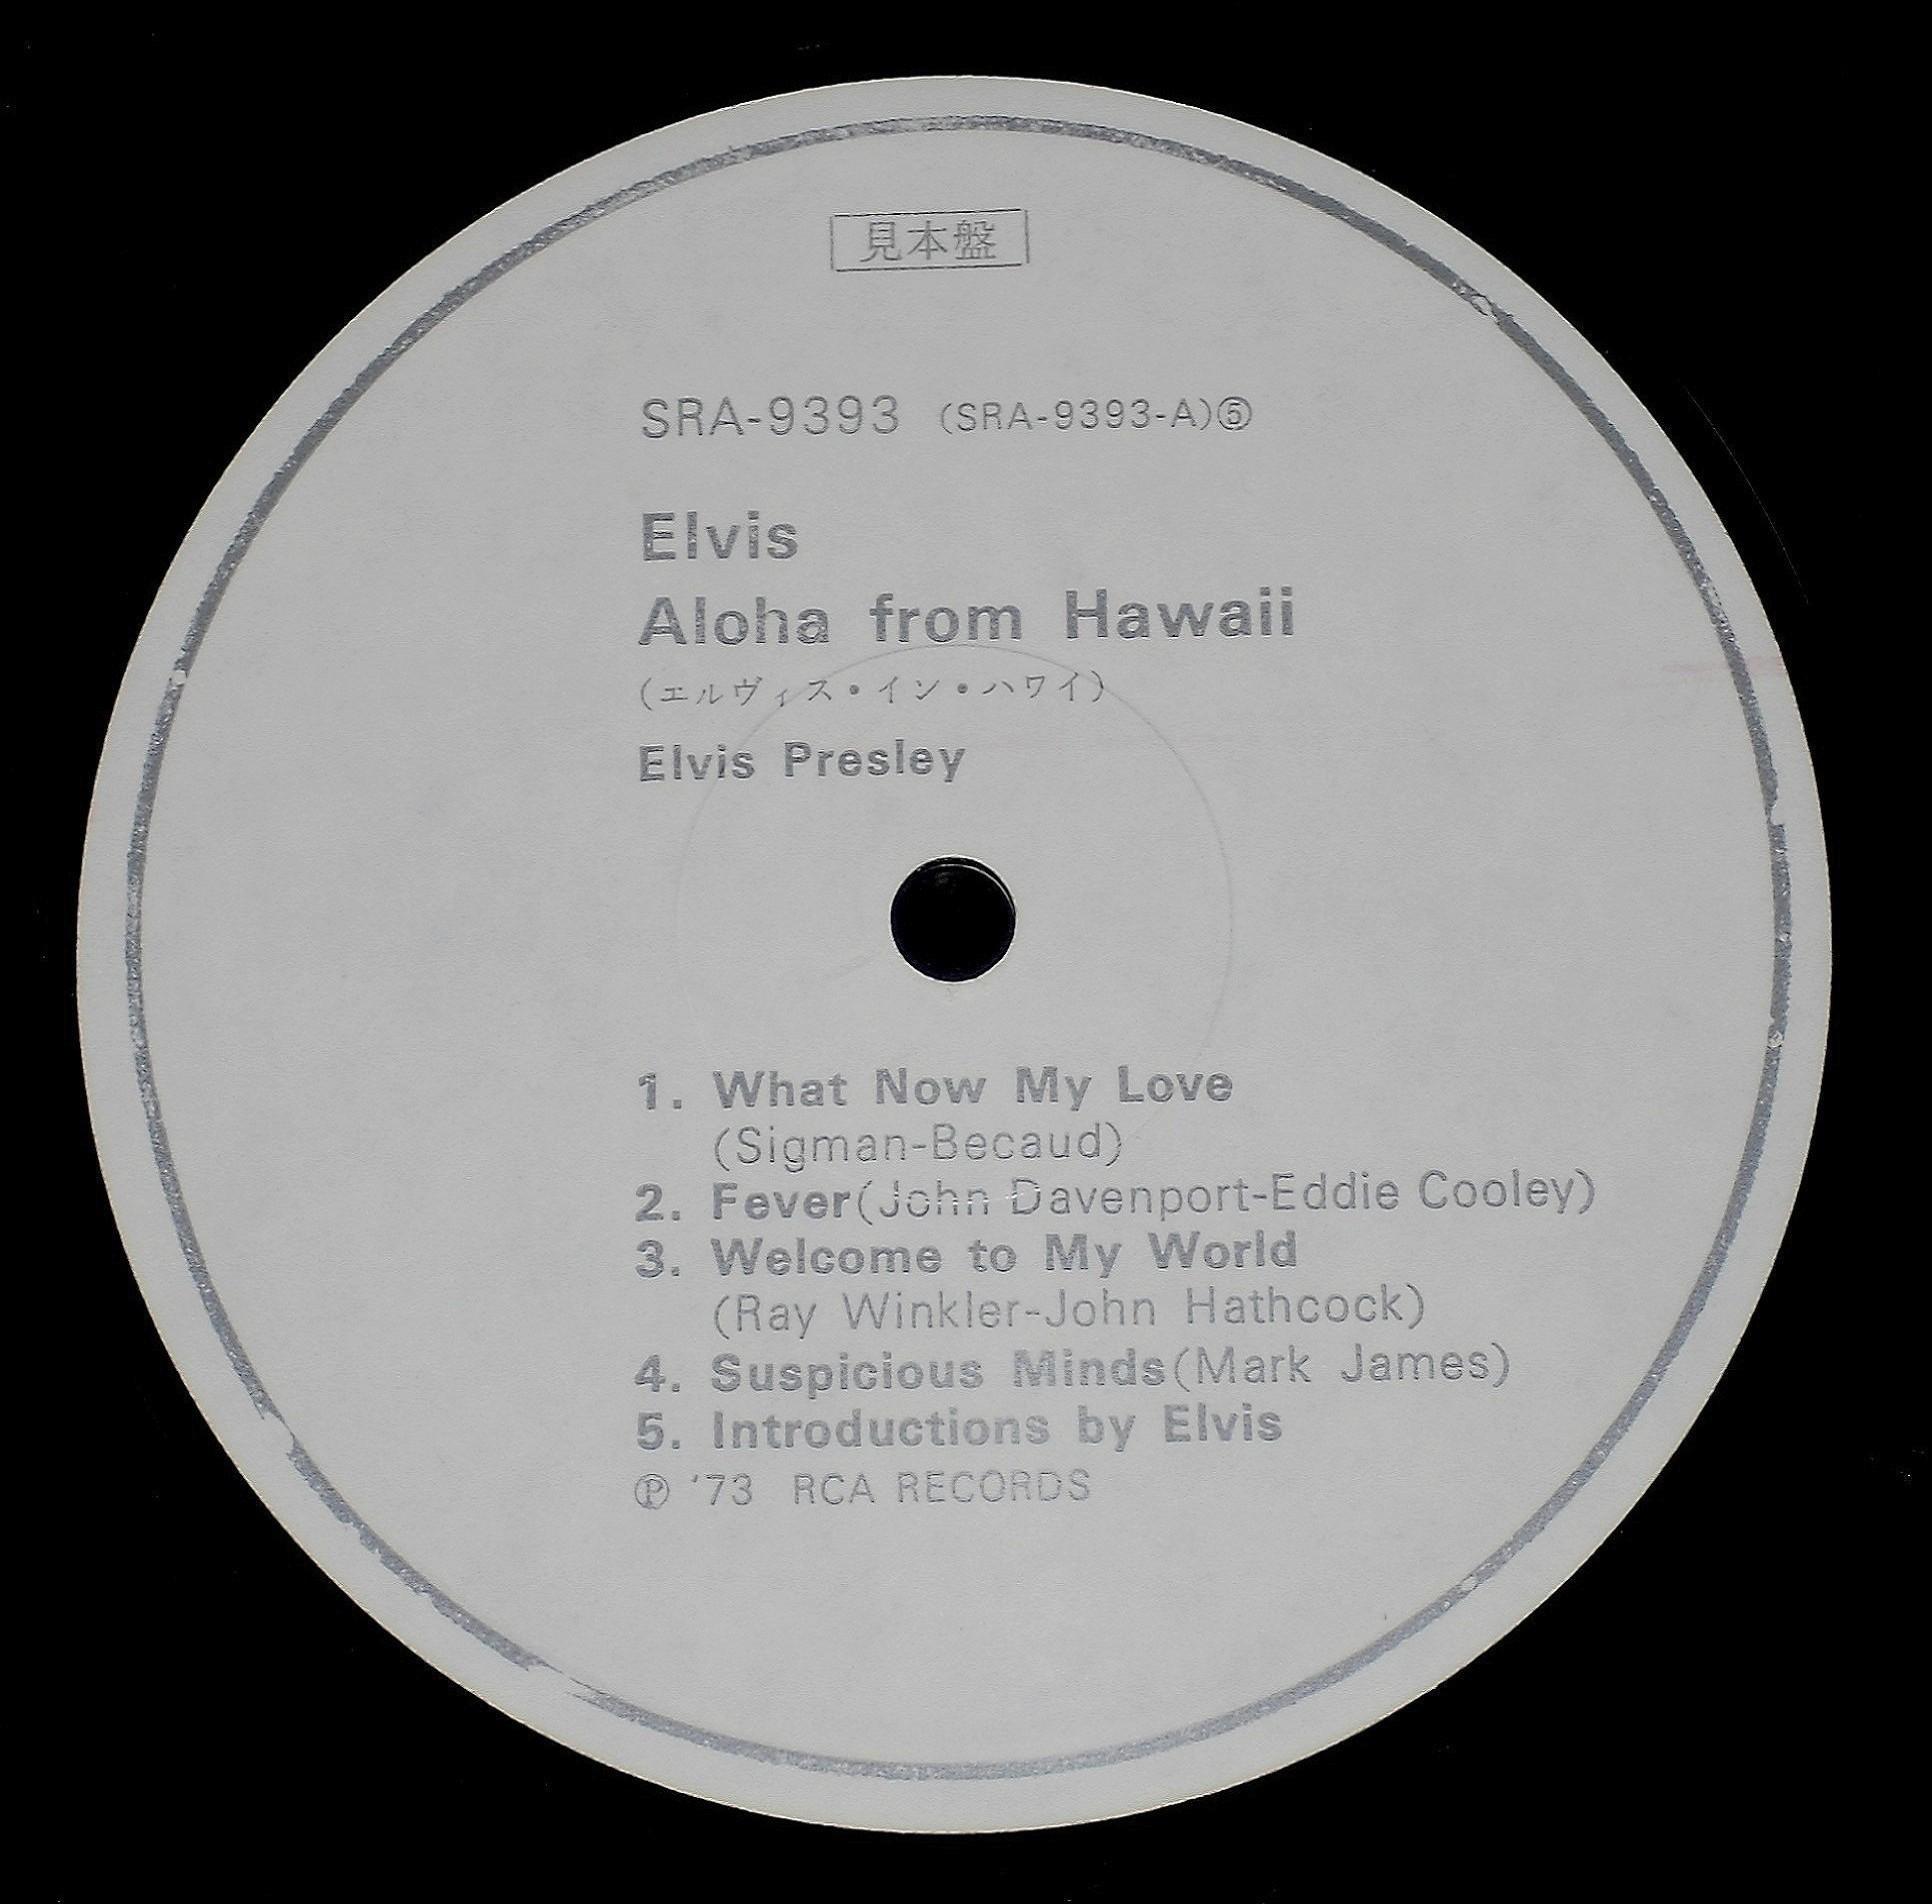 ALOHA FROM HAWAII VIA SATELLITE 04s33drg1